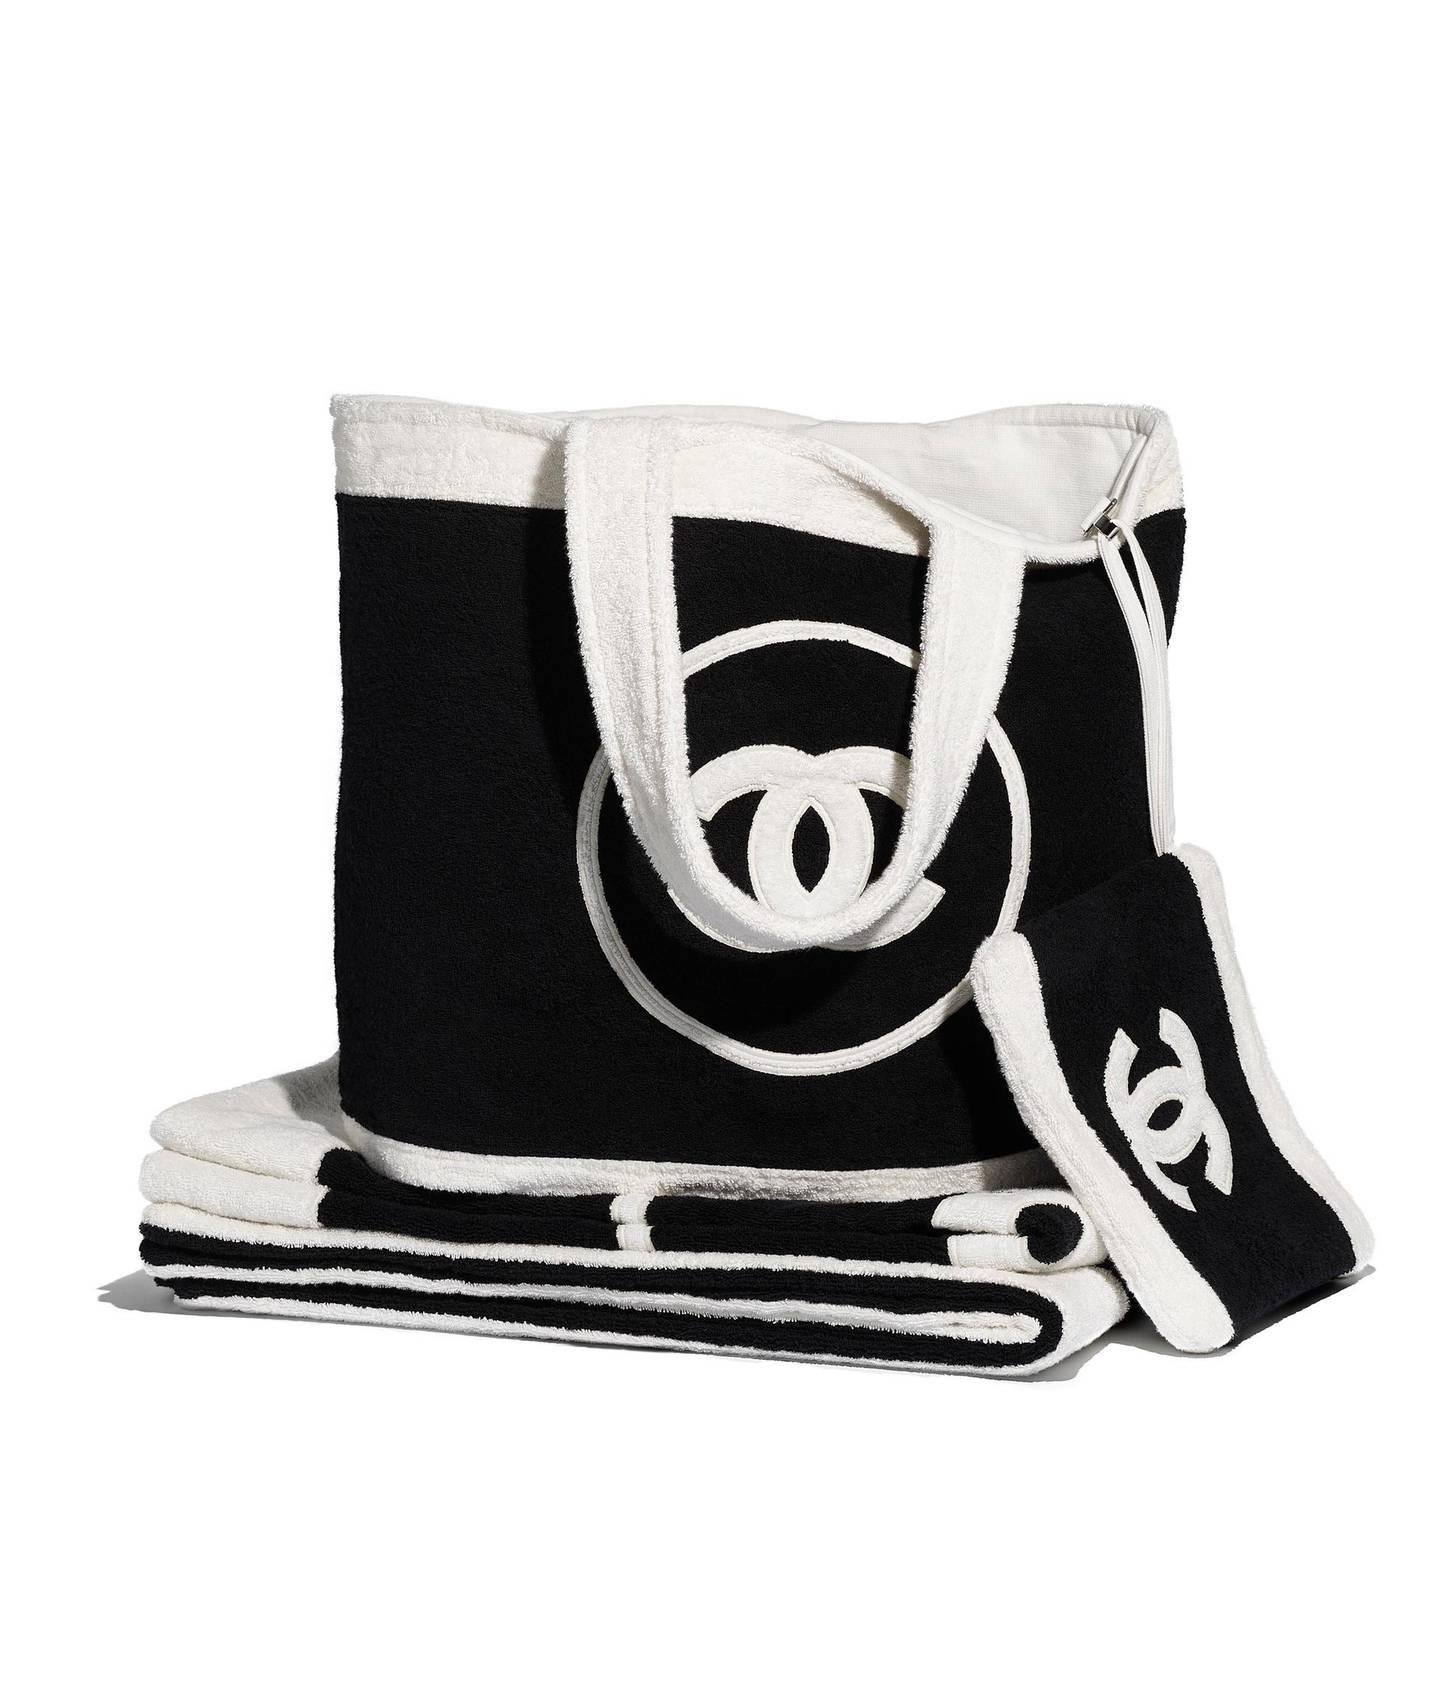 Black beachwear set, courtesy Chanel